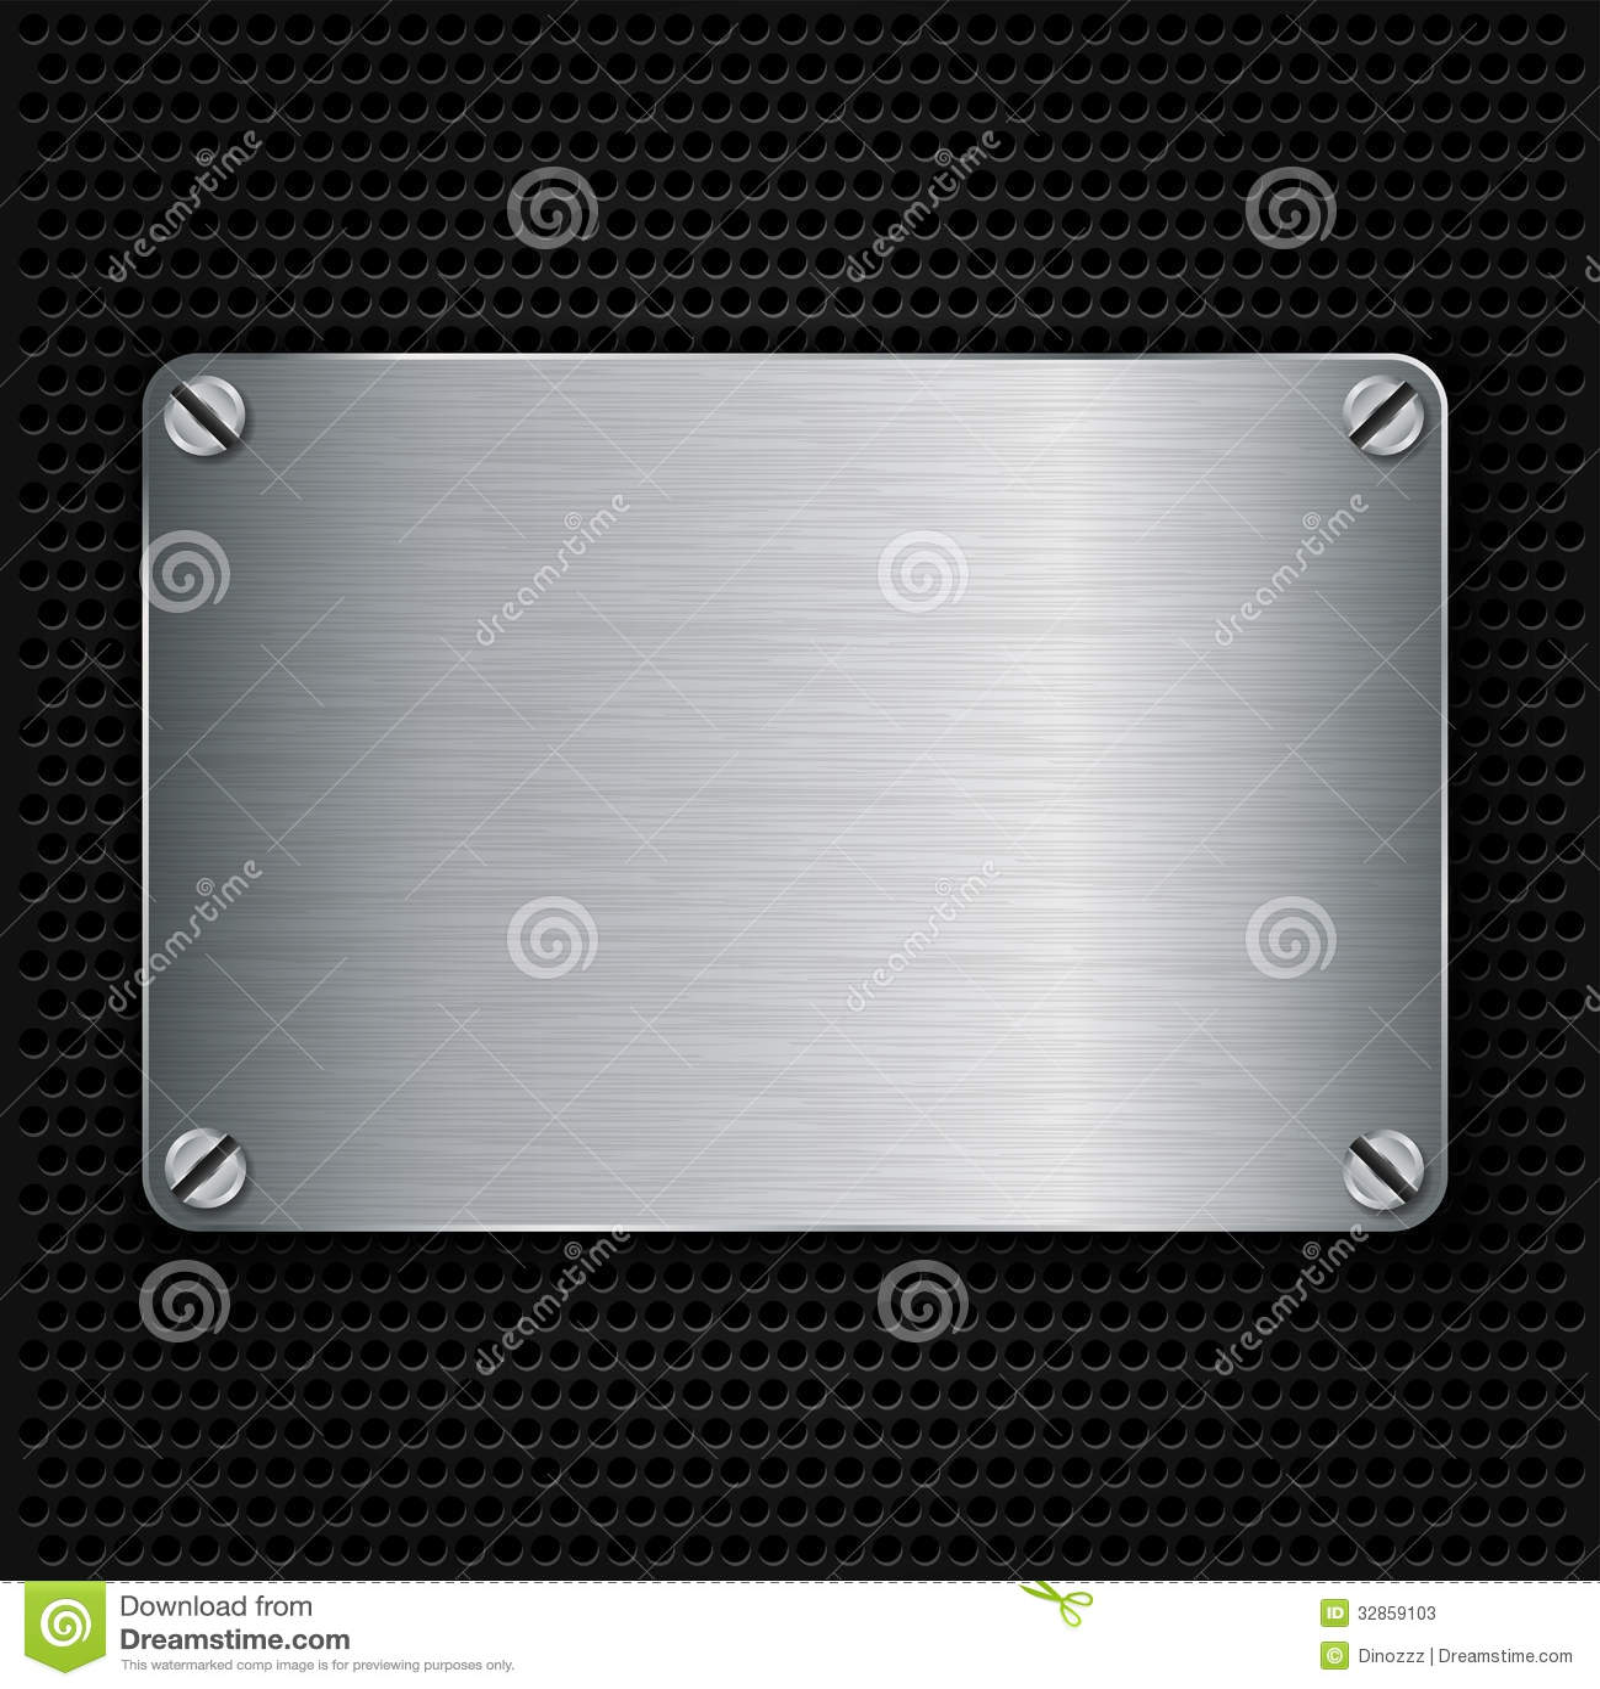 Metal Texture Plate With Screws Stock Photos Image 32859103